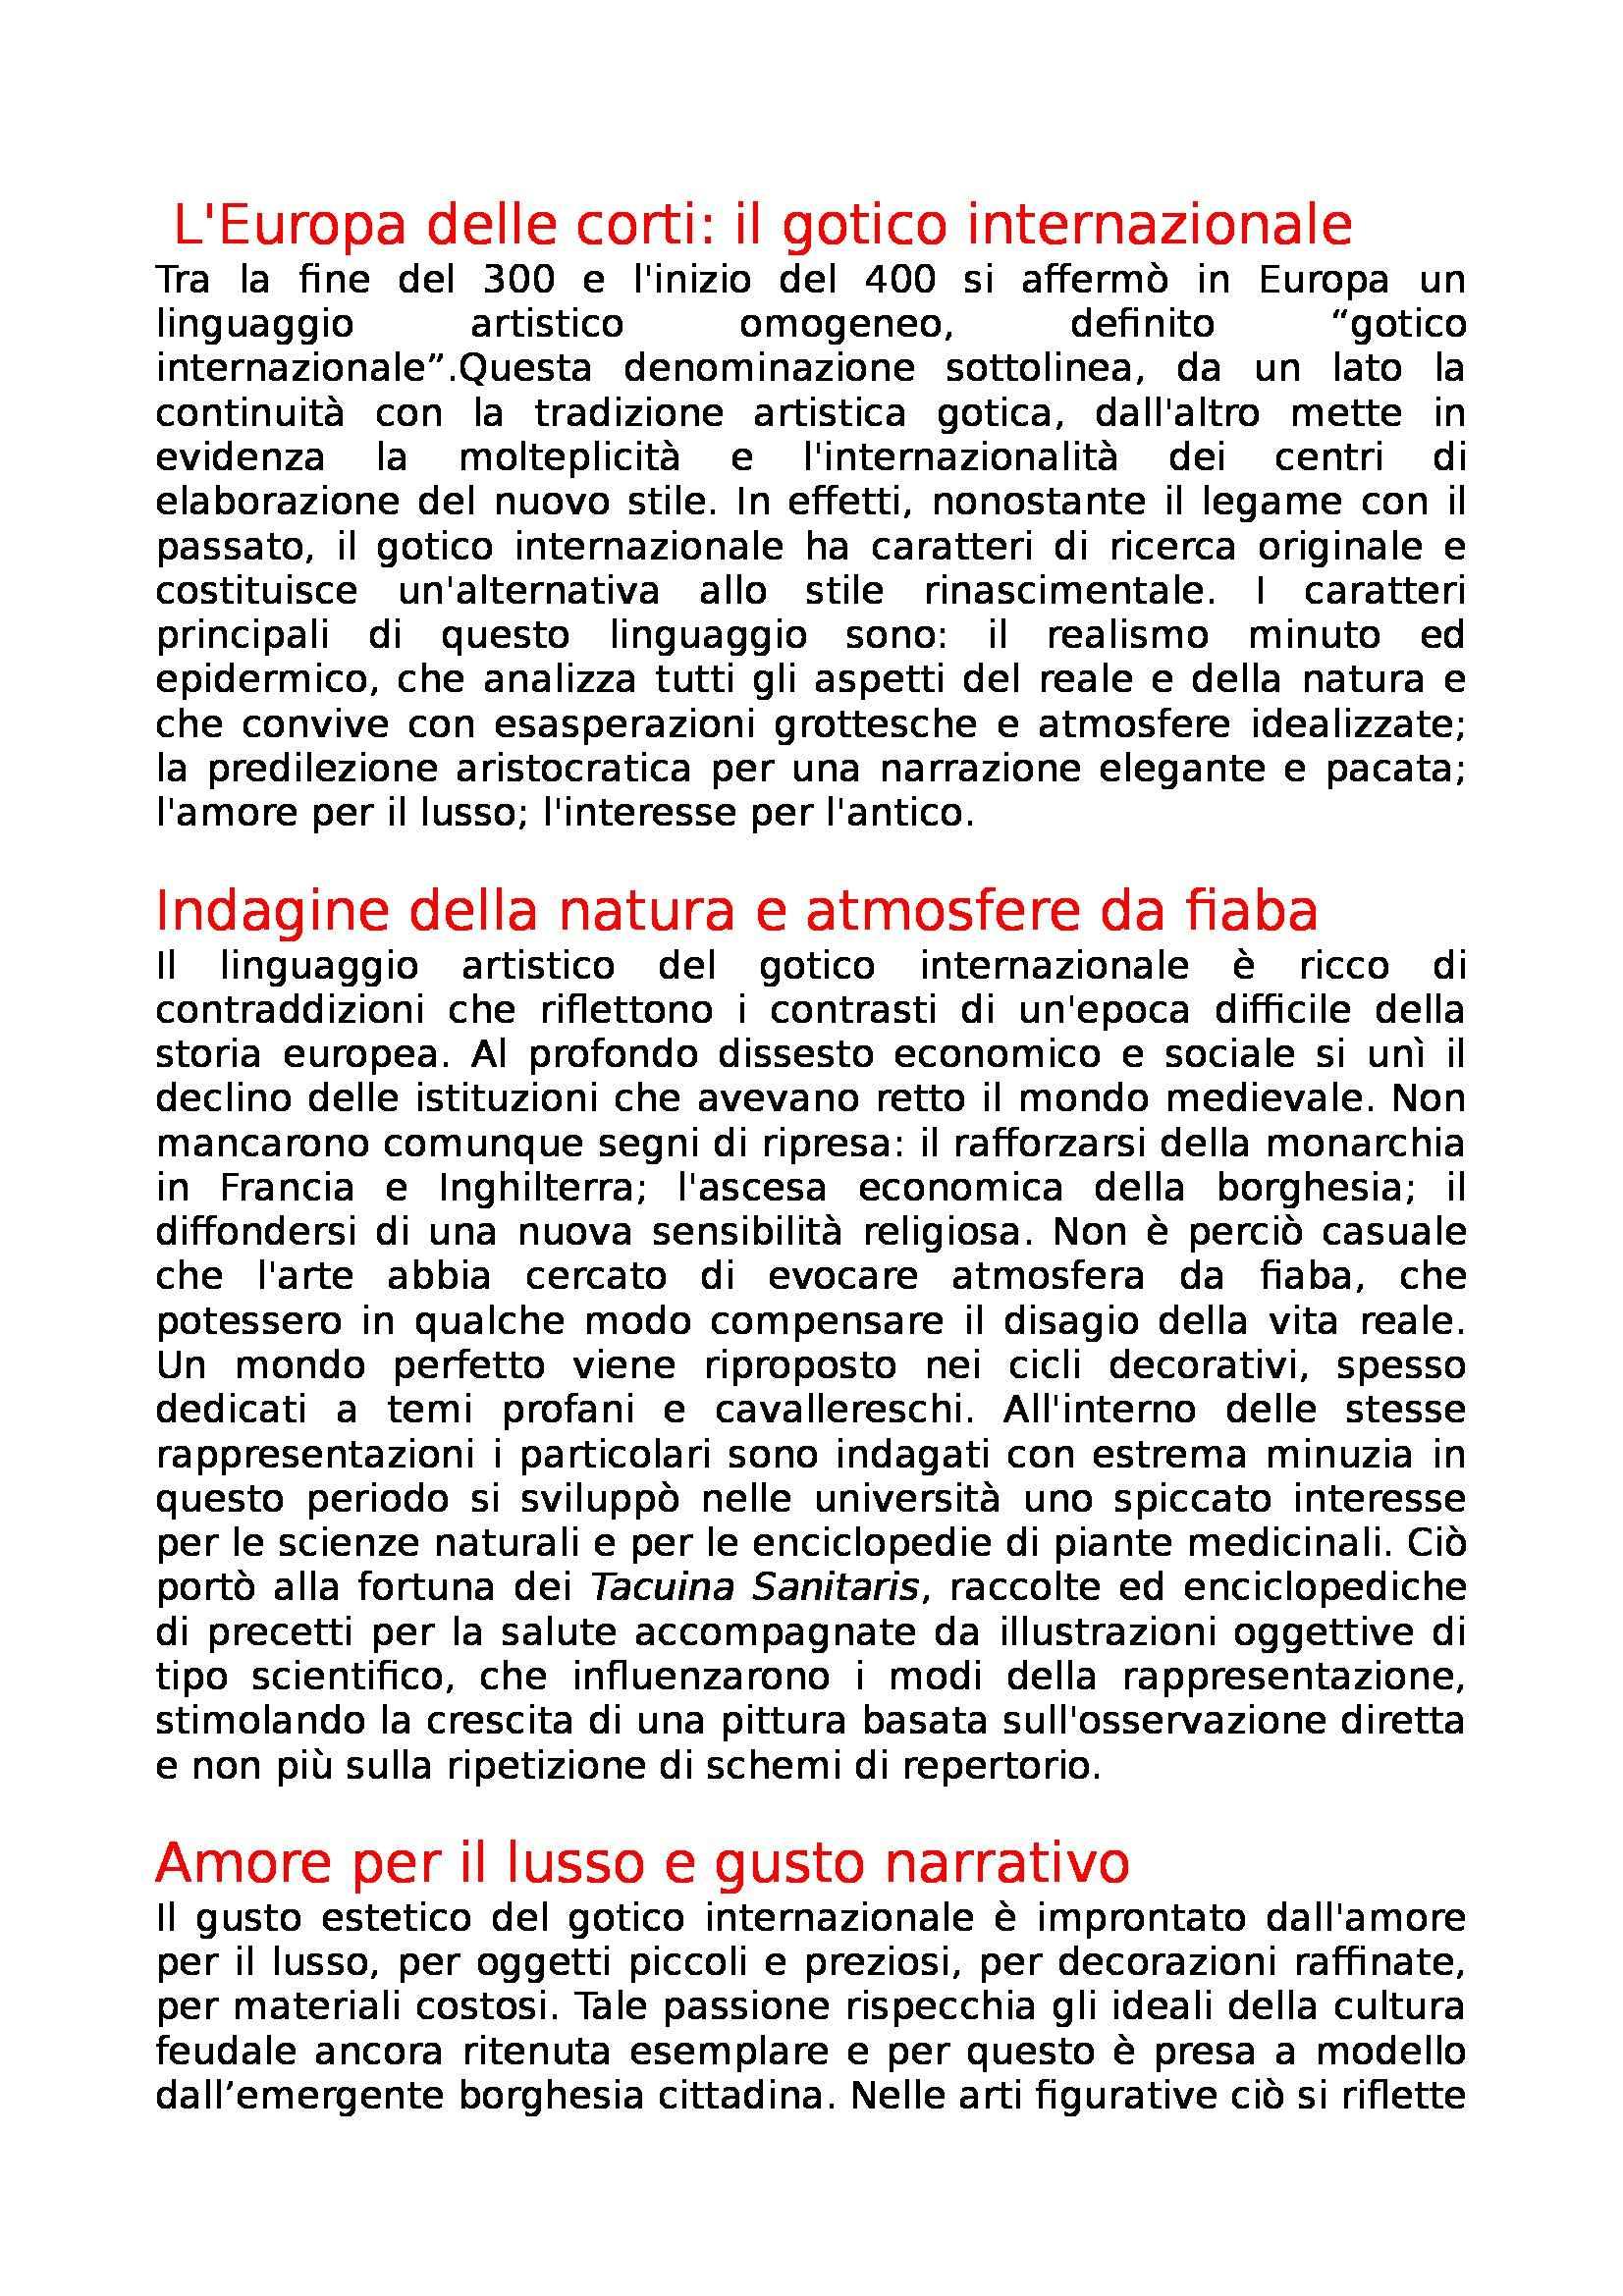 Riassunto esame Storia dell'Arte Moderna, prof. Pinelli, libro consigliato Storia dell'Arte Moderna: Dal Gotico Internazionale al Rinascimento